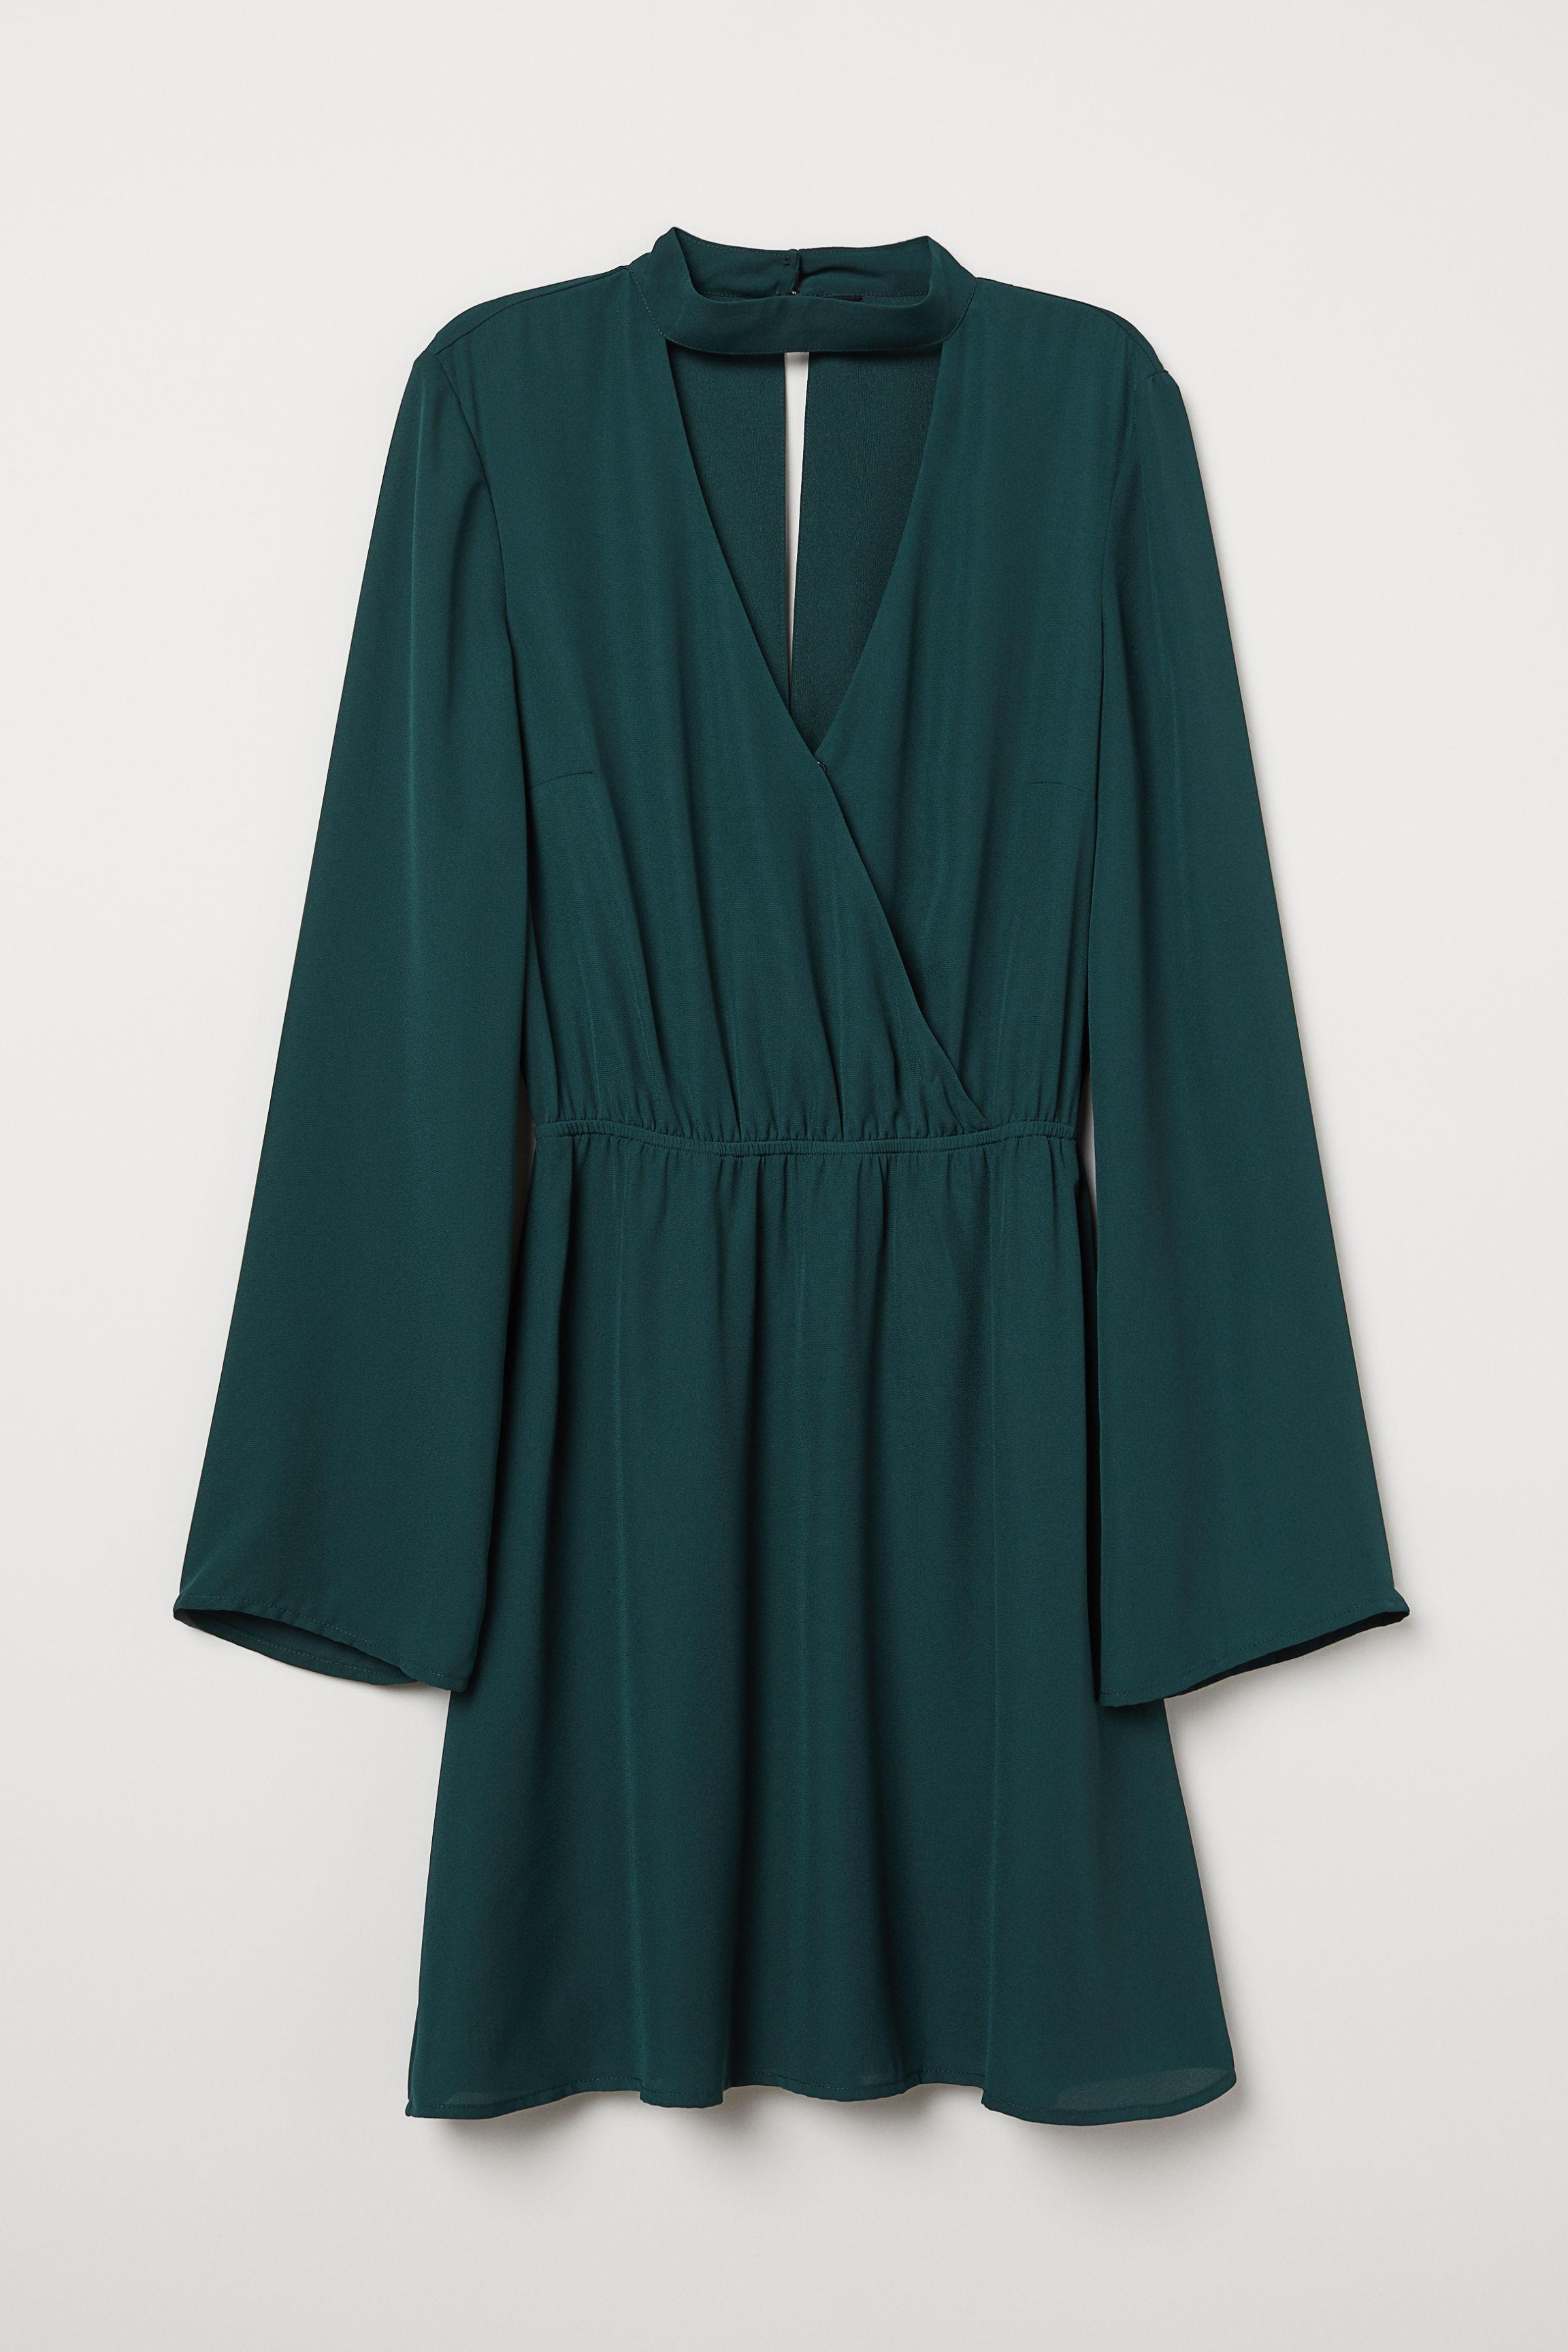 b9748e47fe7 Robe croisée à encolure en V - Noir - FEMME